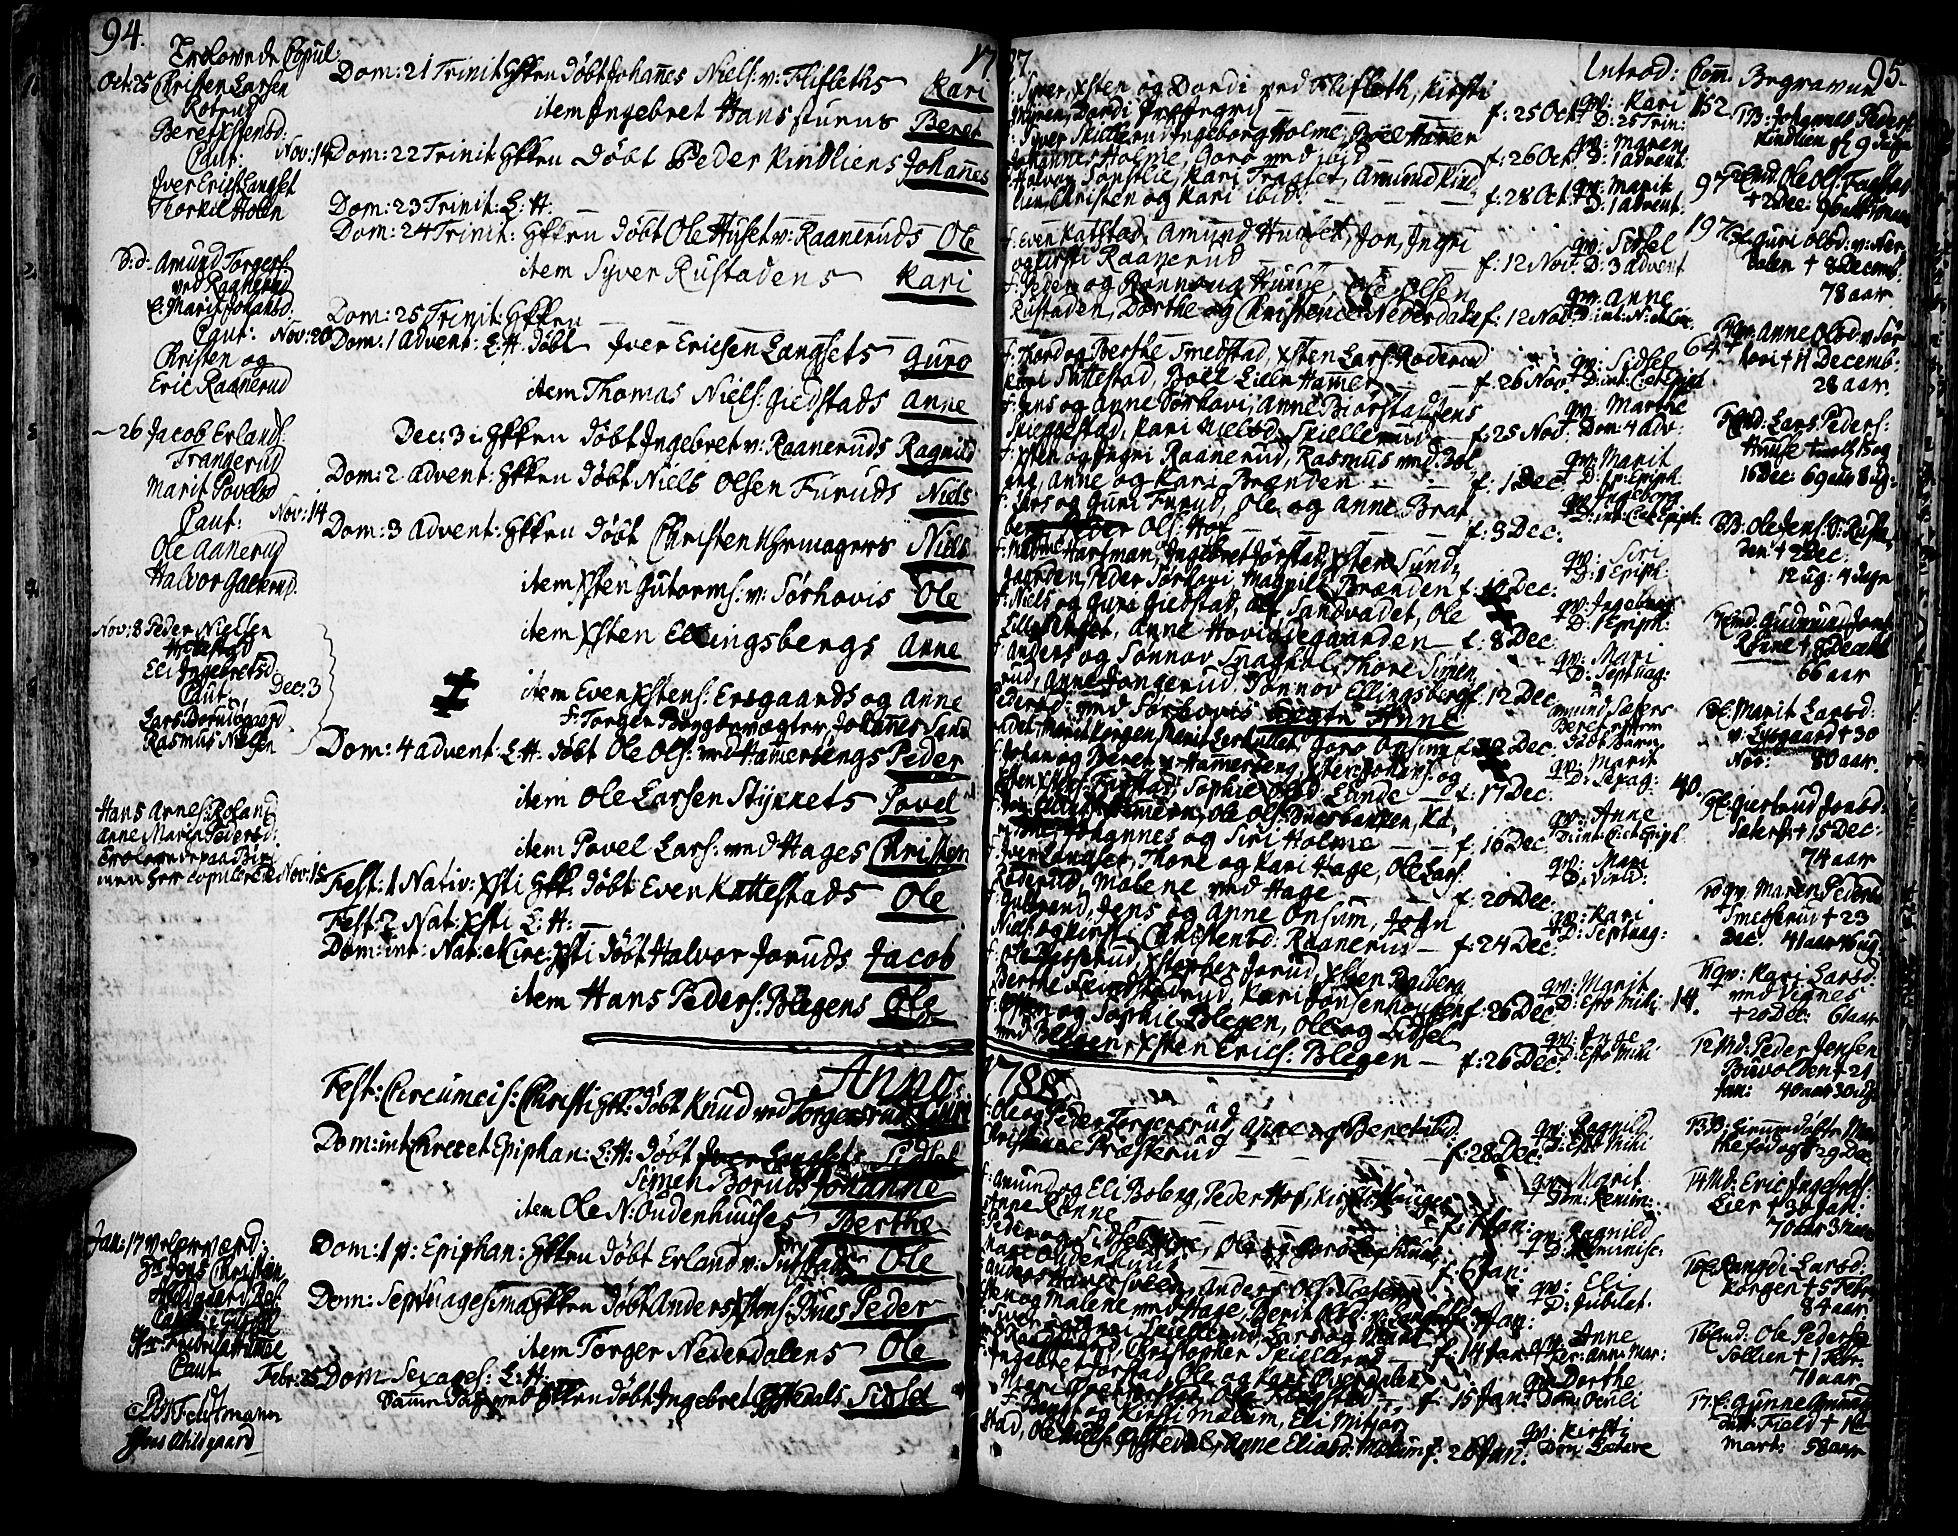 SAH, Fåberg prestekontor, Ministerialbok nr. 2, 1775-1818, s. 94-95